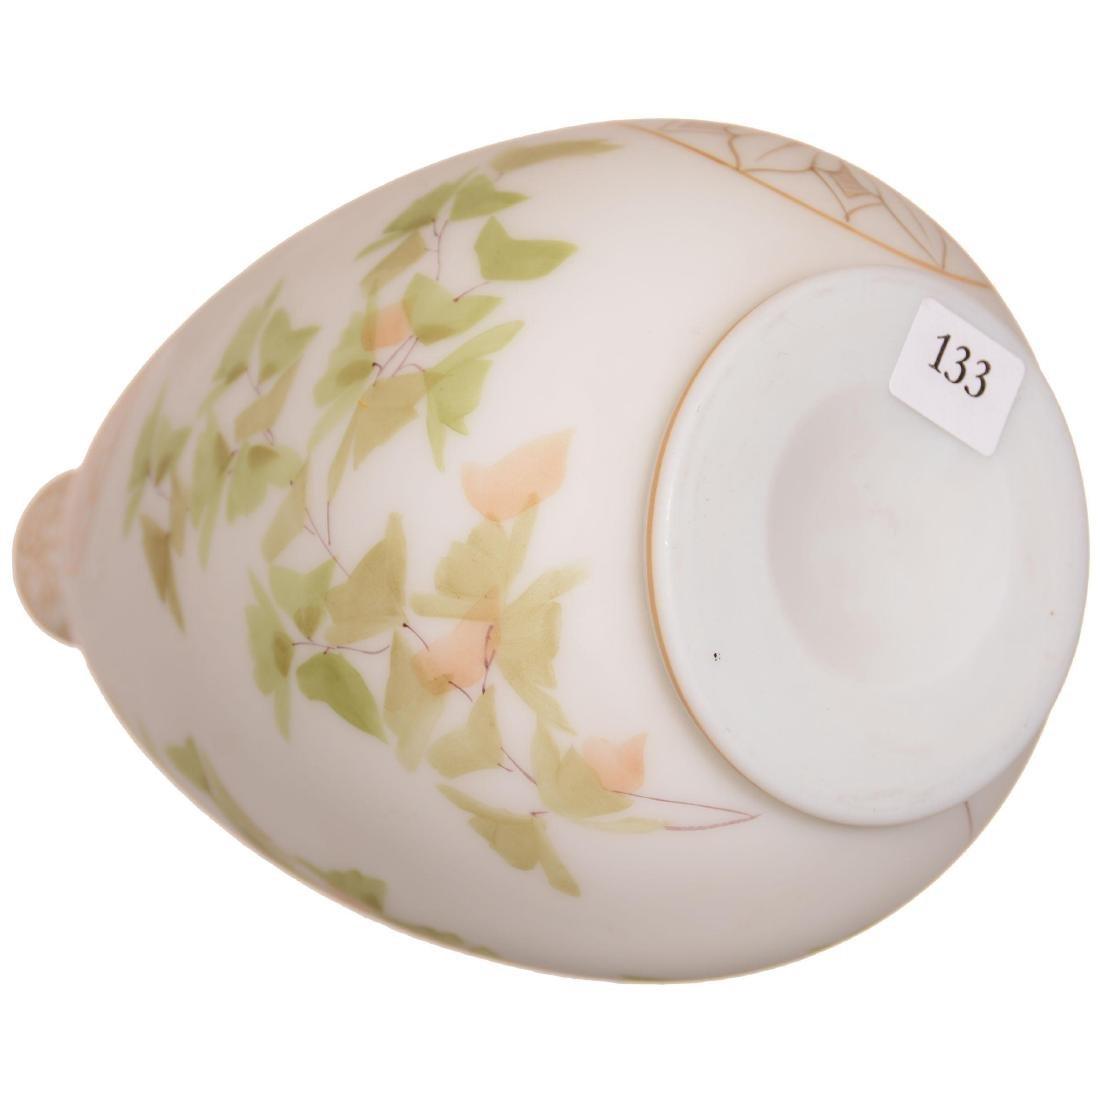 Unmarked Crown Milano Vase - 2